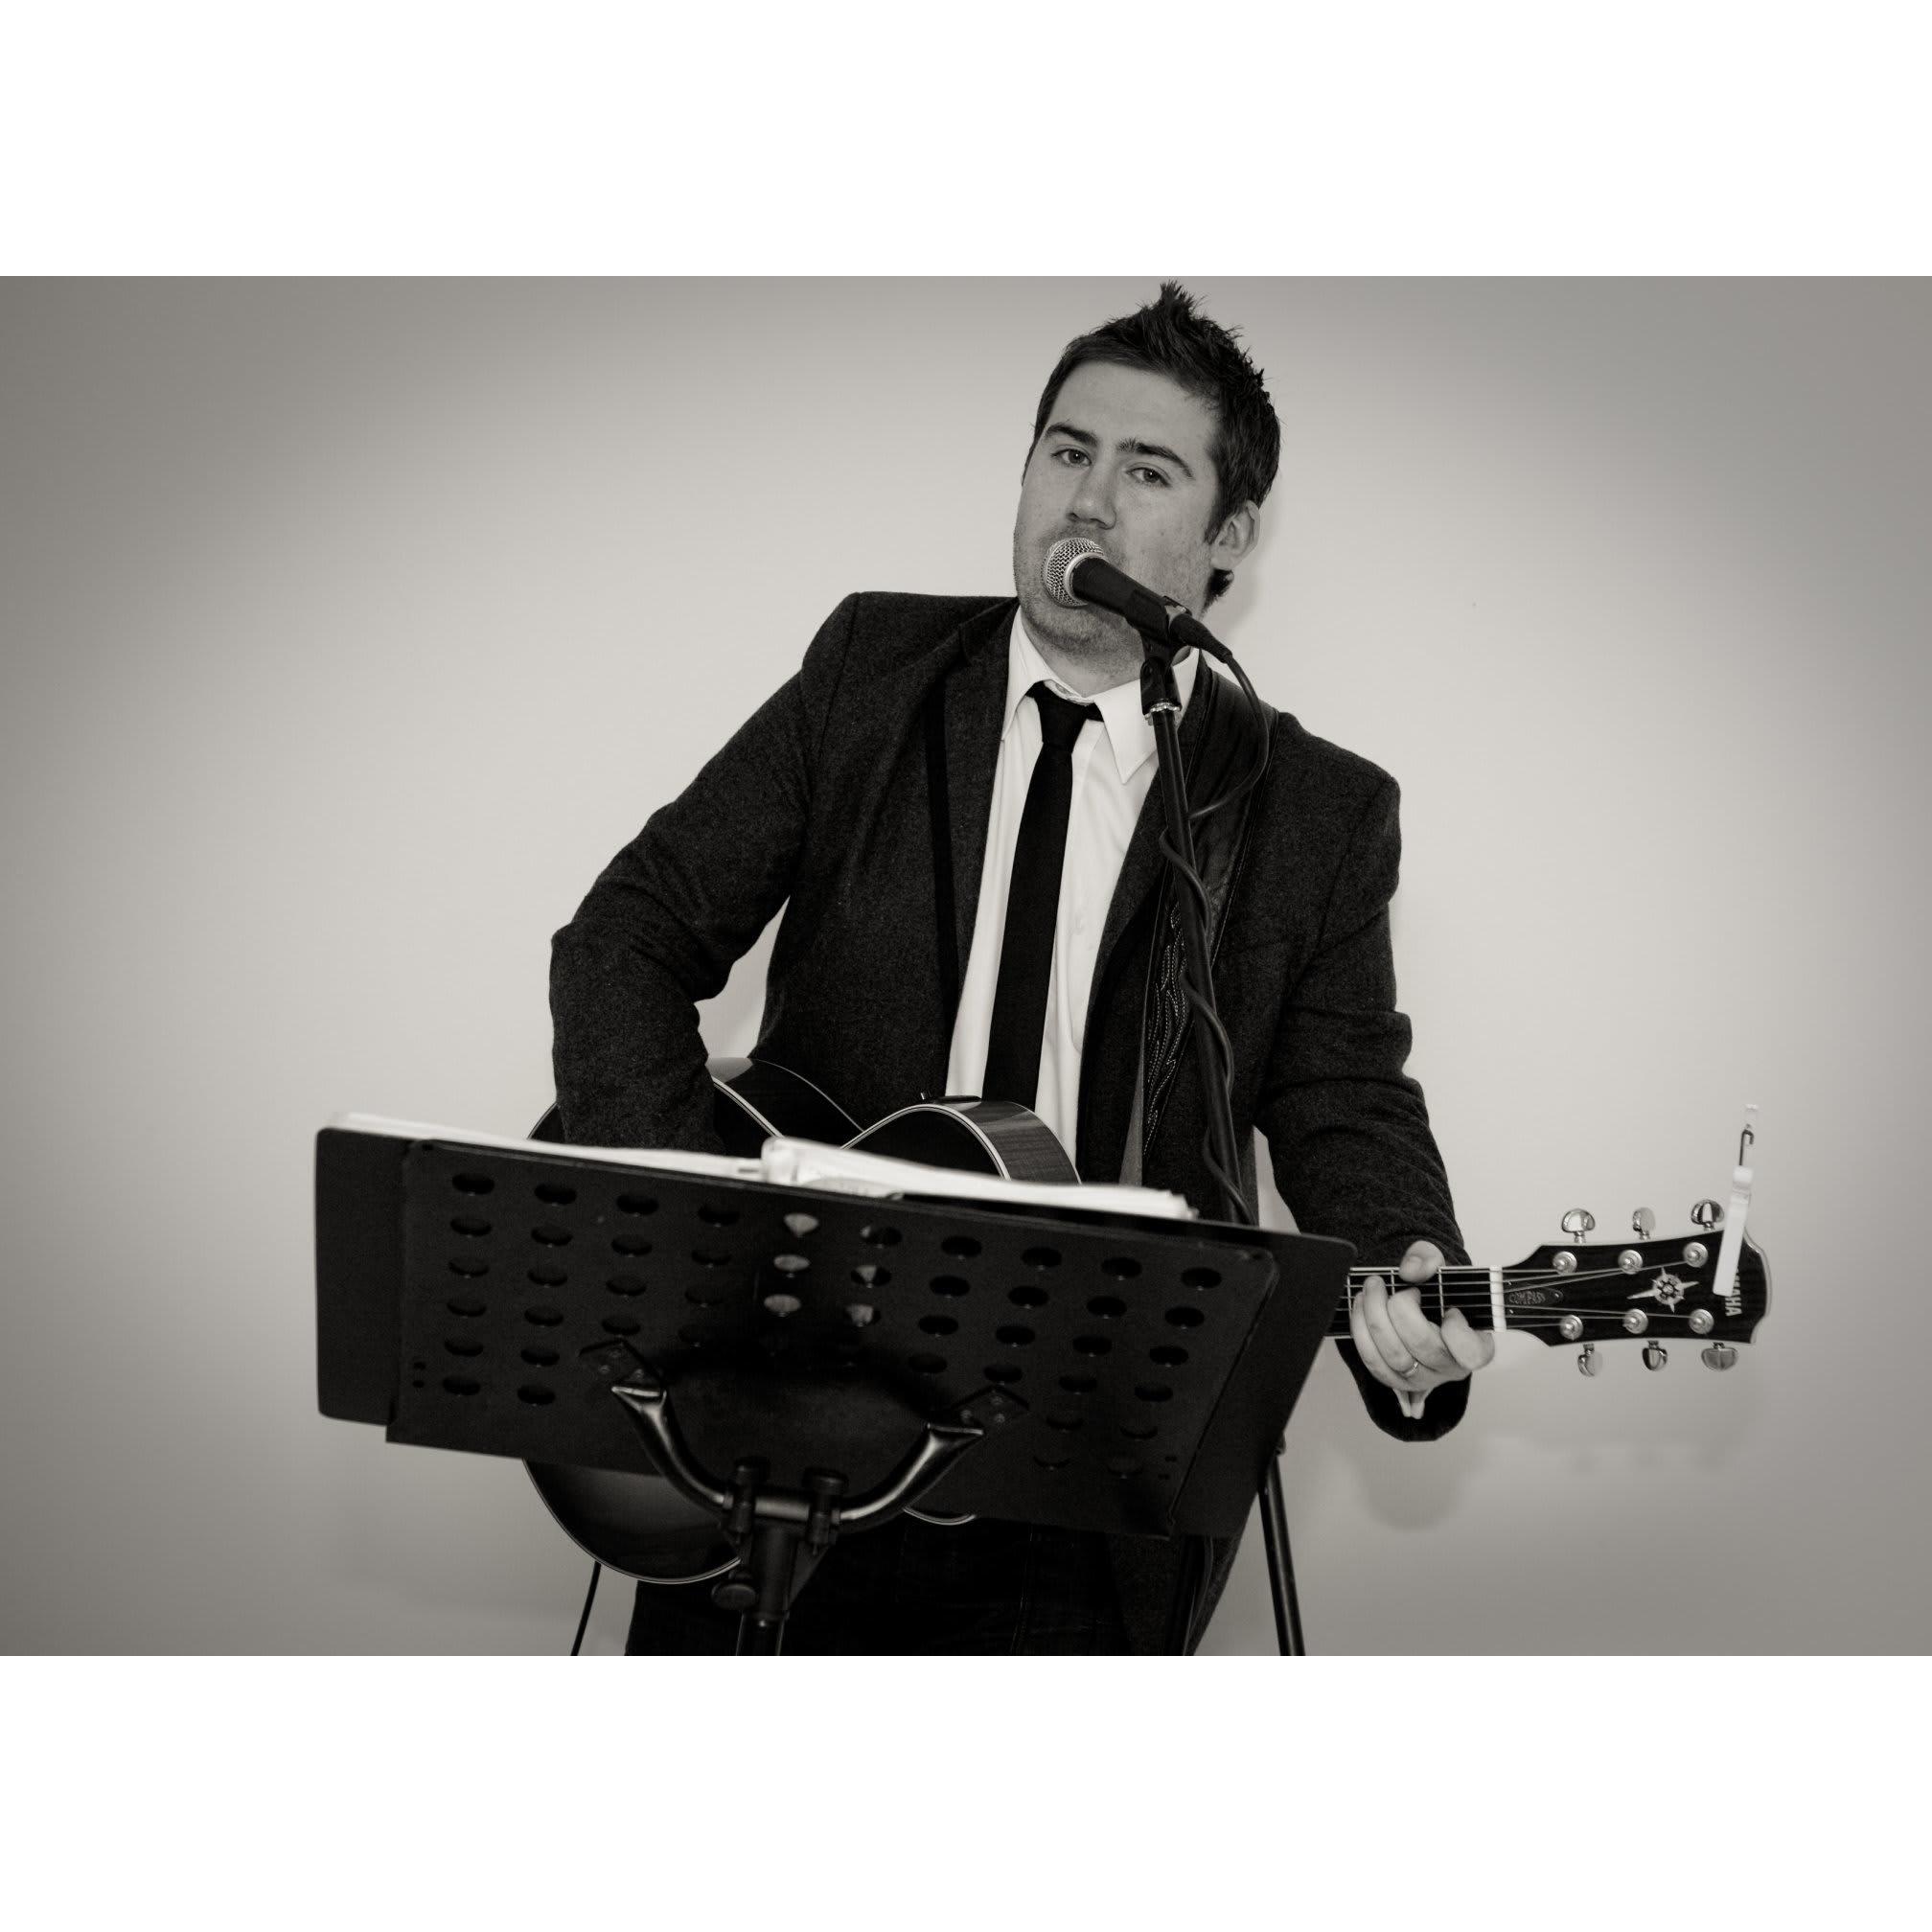 Jamie McGuire Musician